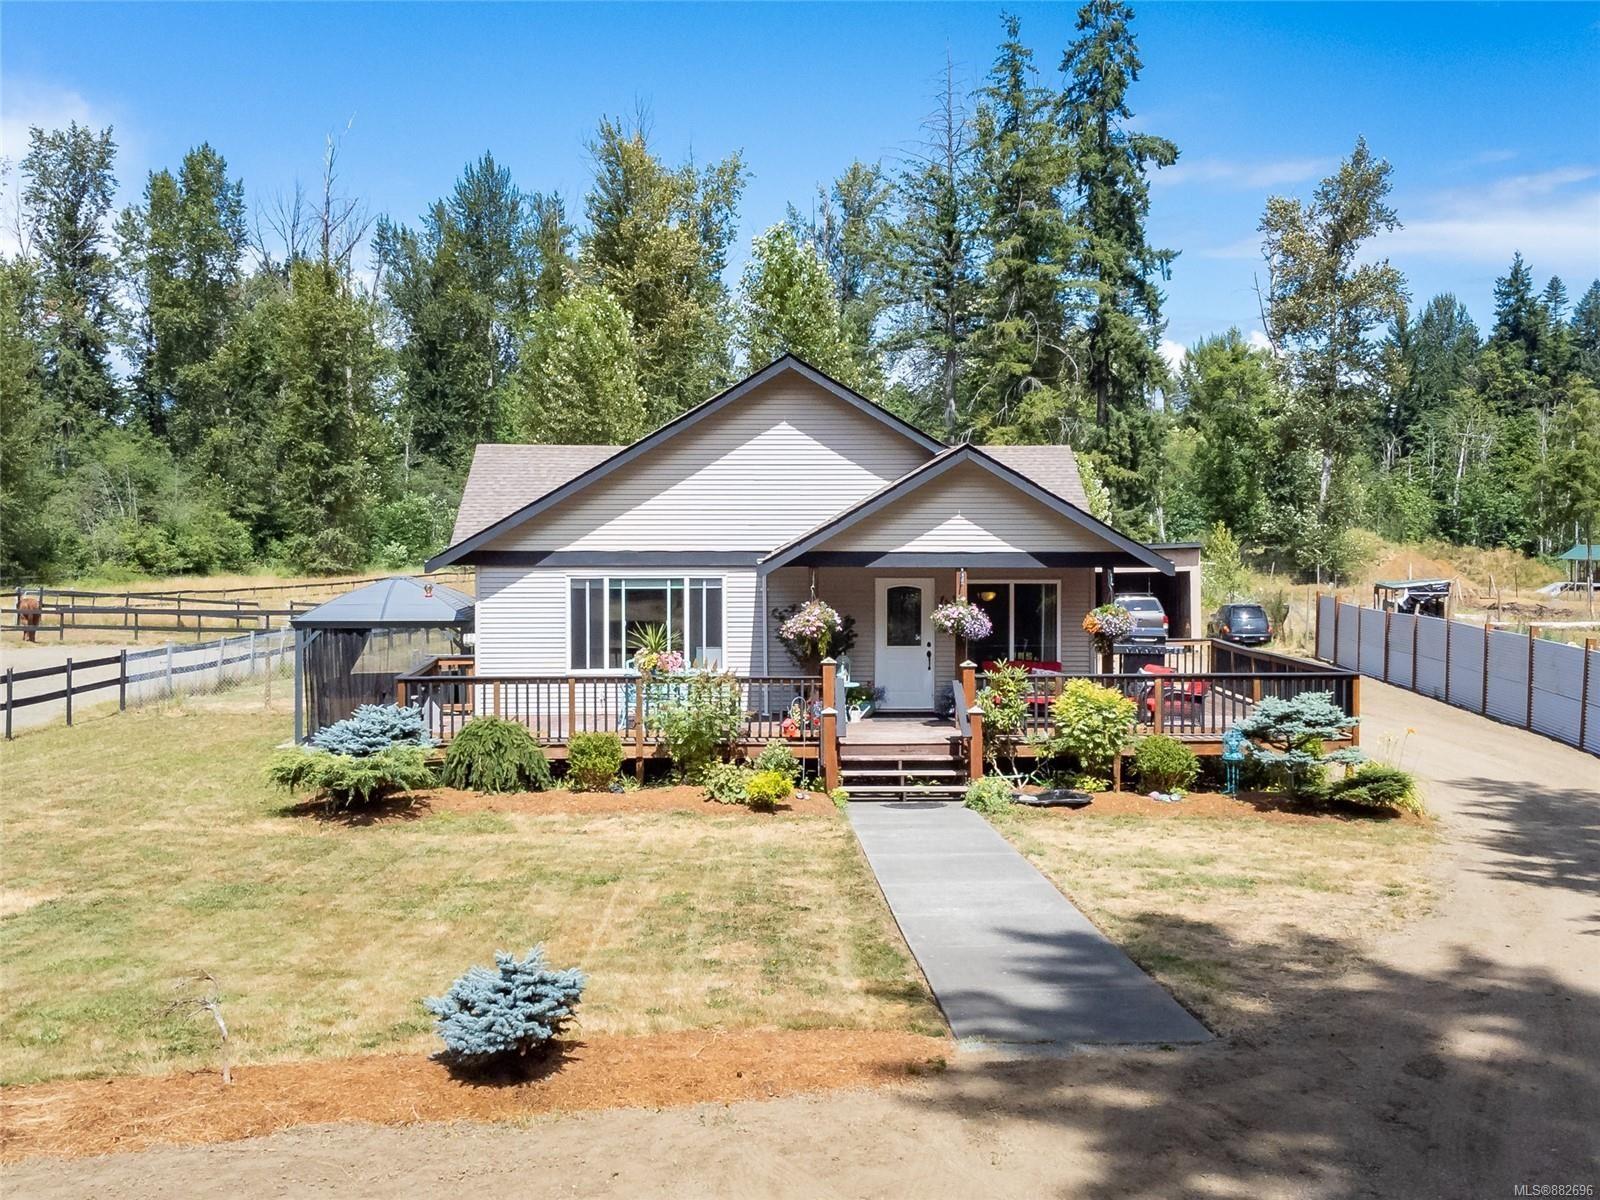 Photo 39: Photos: 3554 MacAulay Rd in : CV Merville Black Creek House for sale (Comox Valley)  : MLS®# 882696